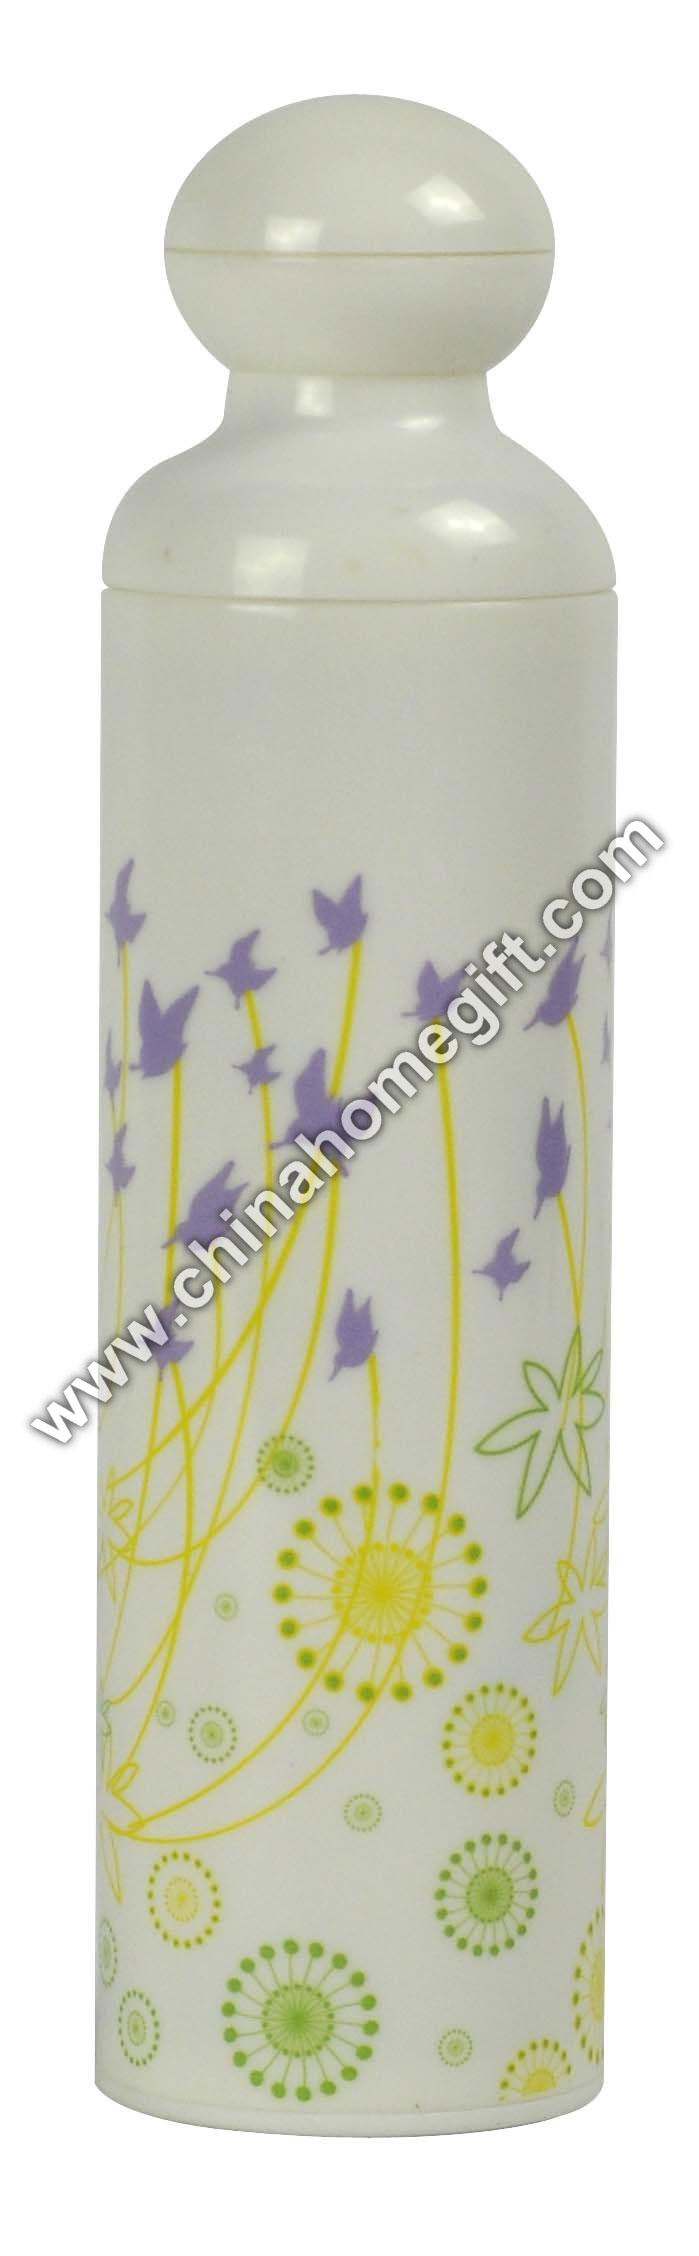 19*6k 5 Sections Fragrance Umbrella